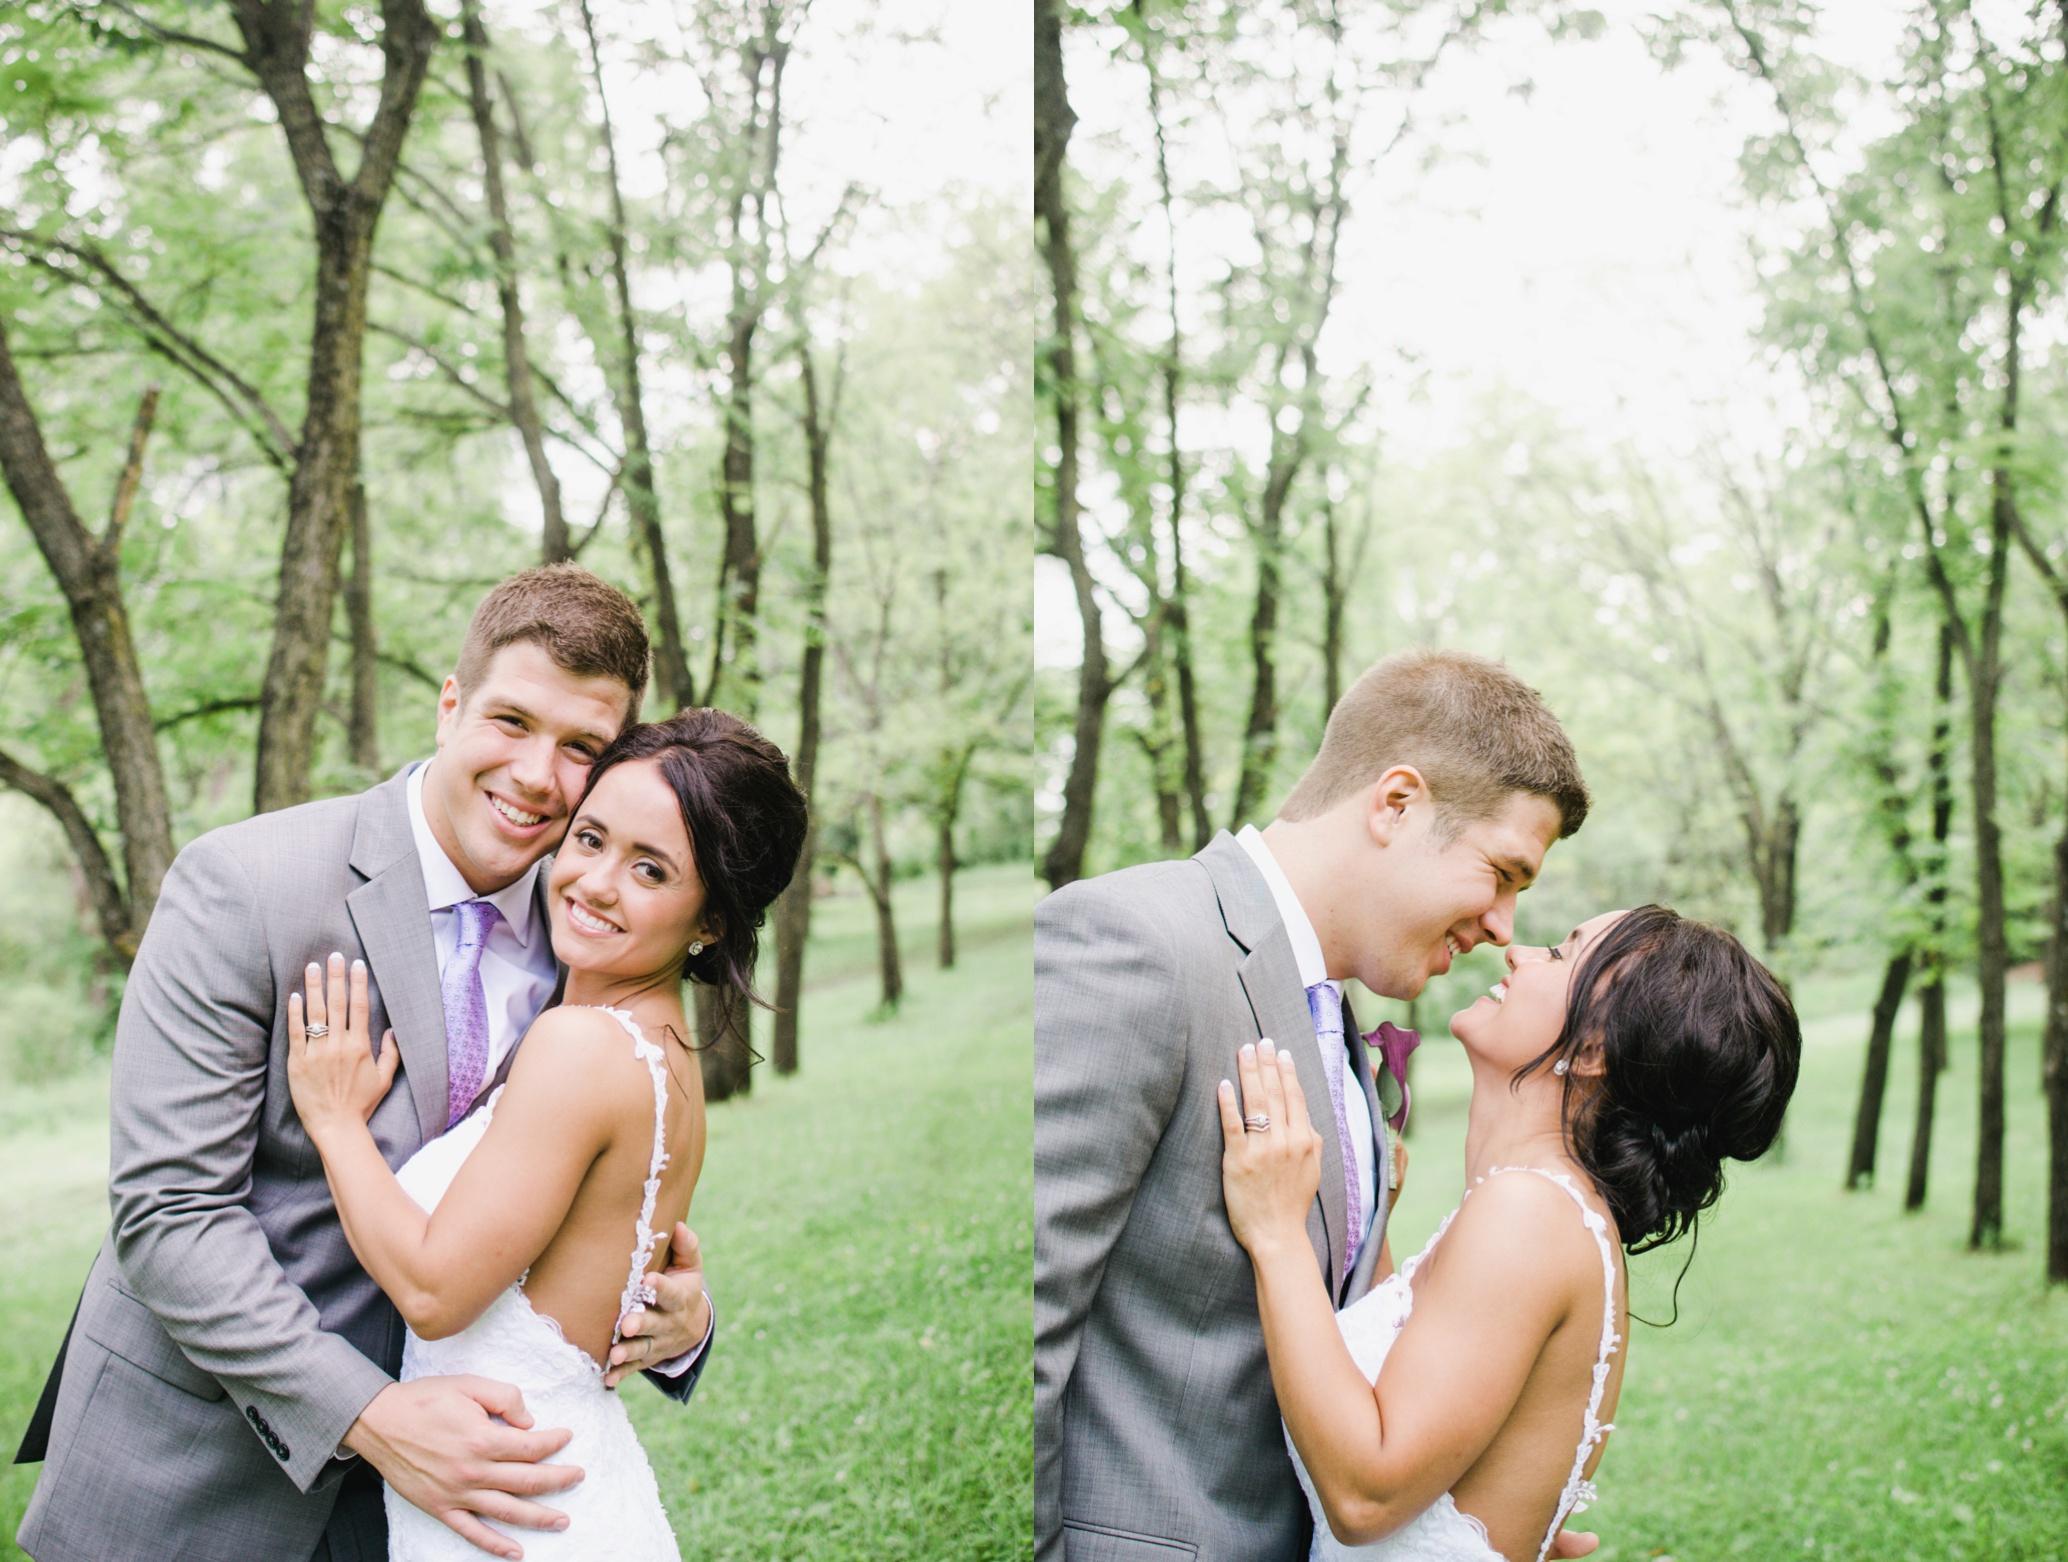 Barnes' Place Rustic Outdoor Wedding | Ali Leigh Photo Minneapolis Wedding Photographer_0155.jpg